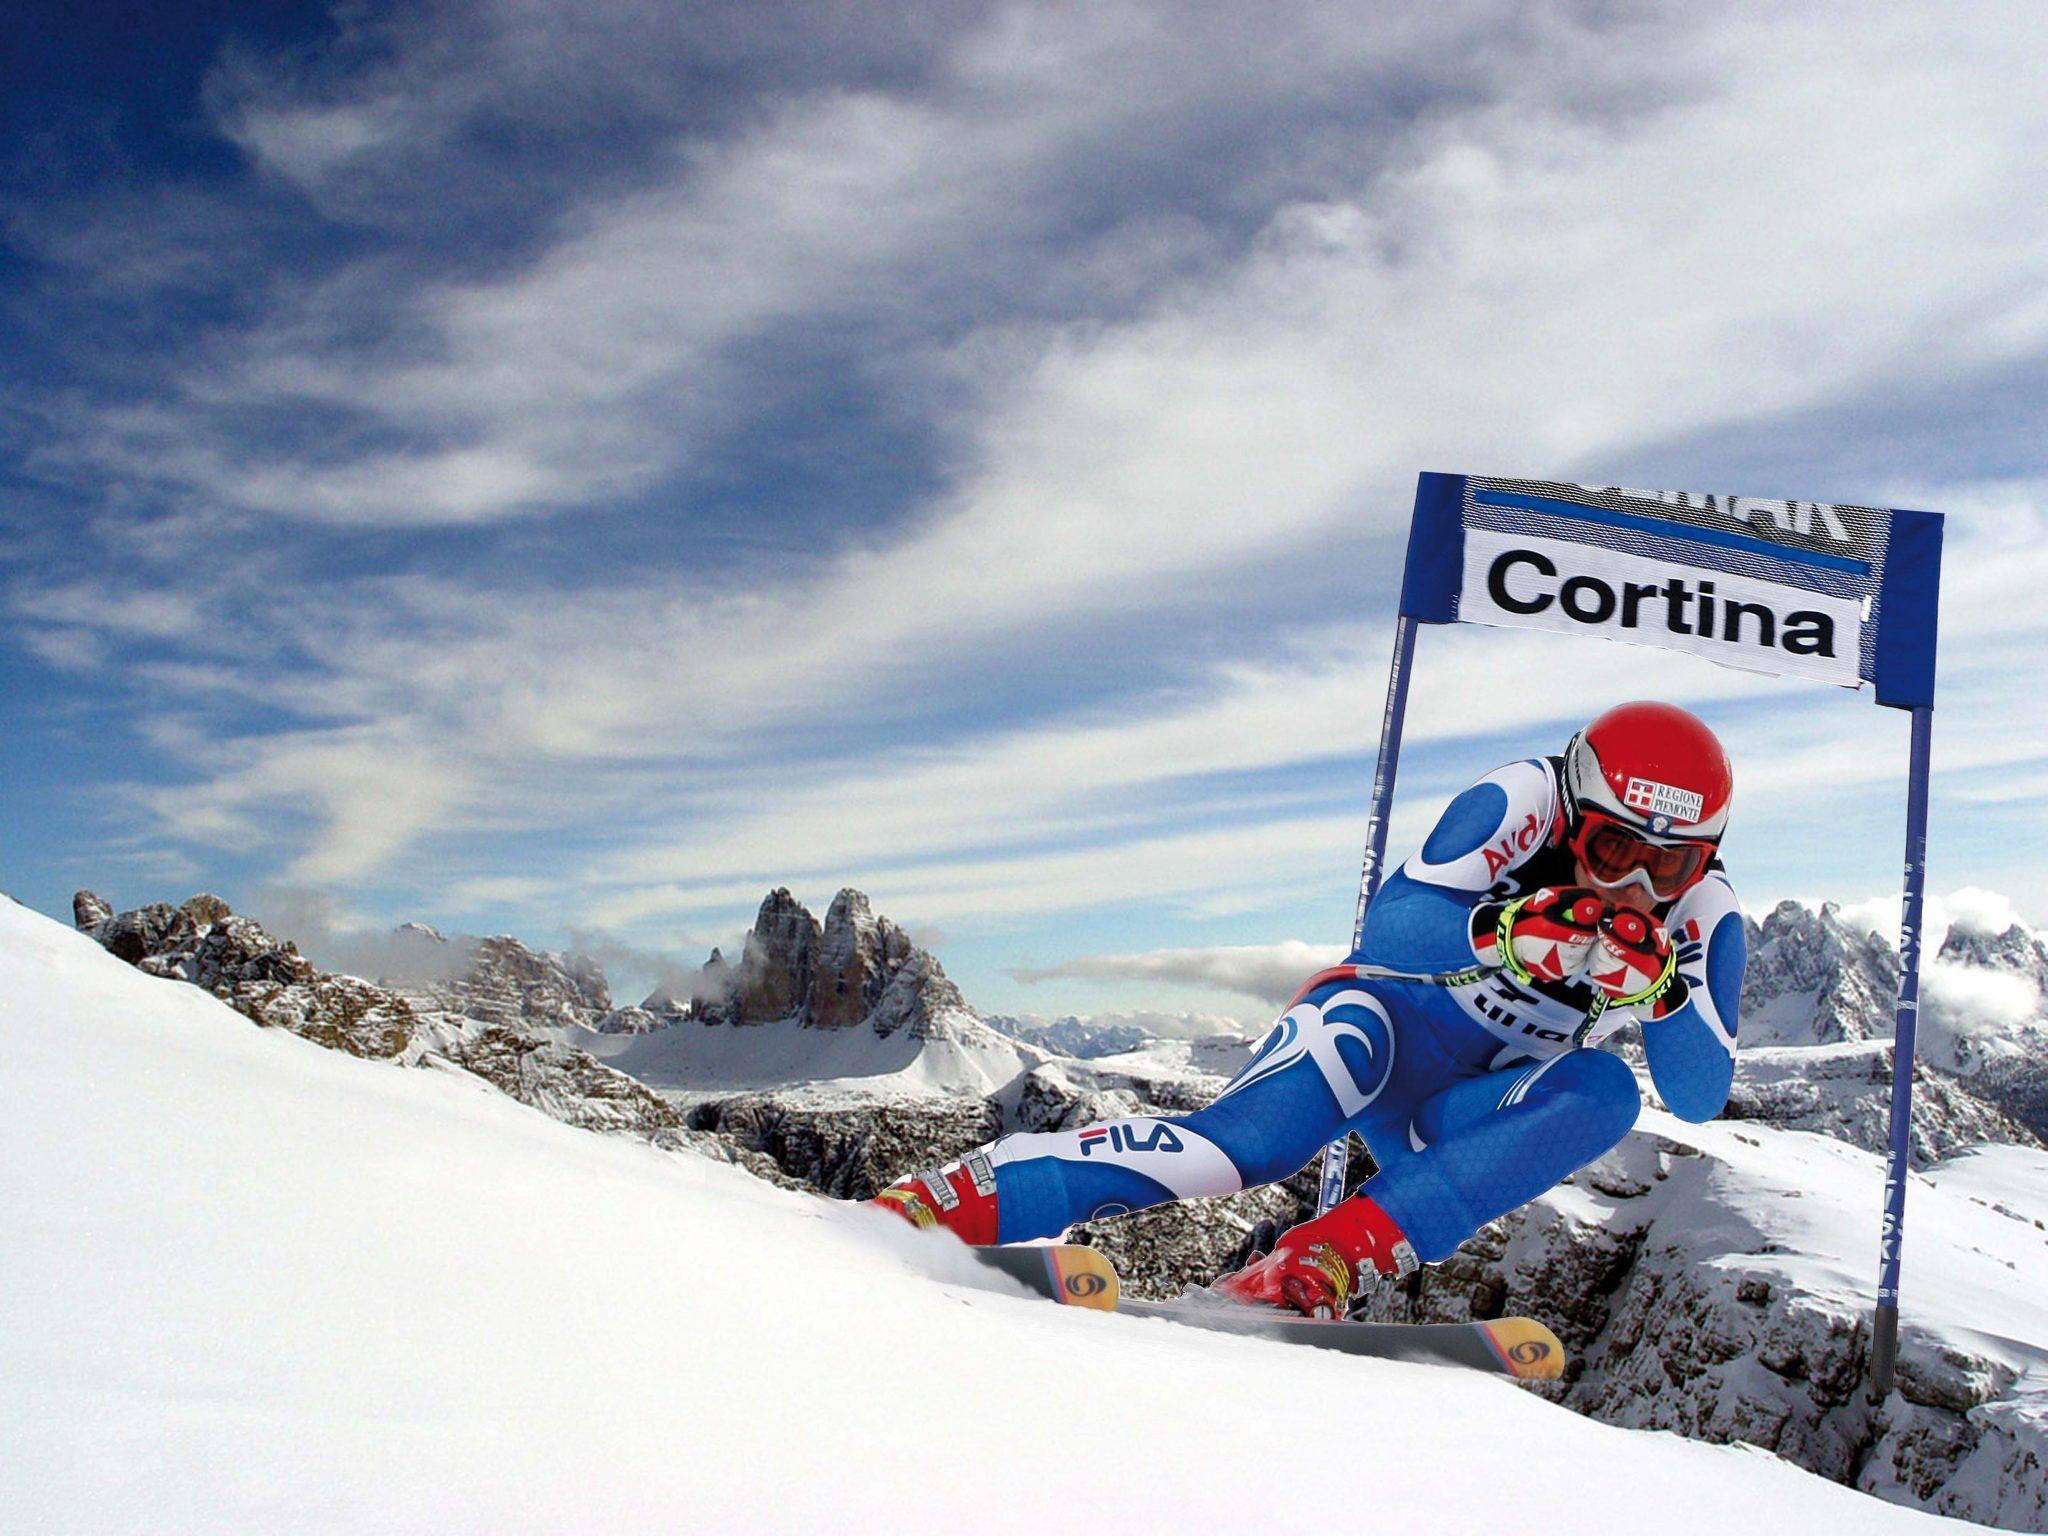 Cortina 2021 Championships